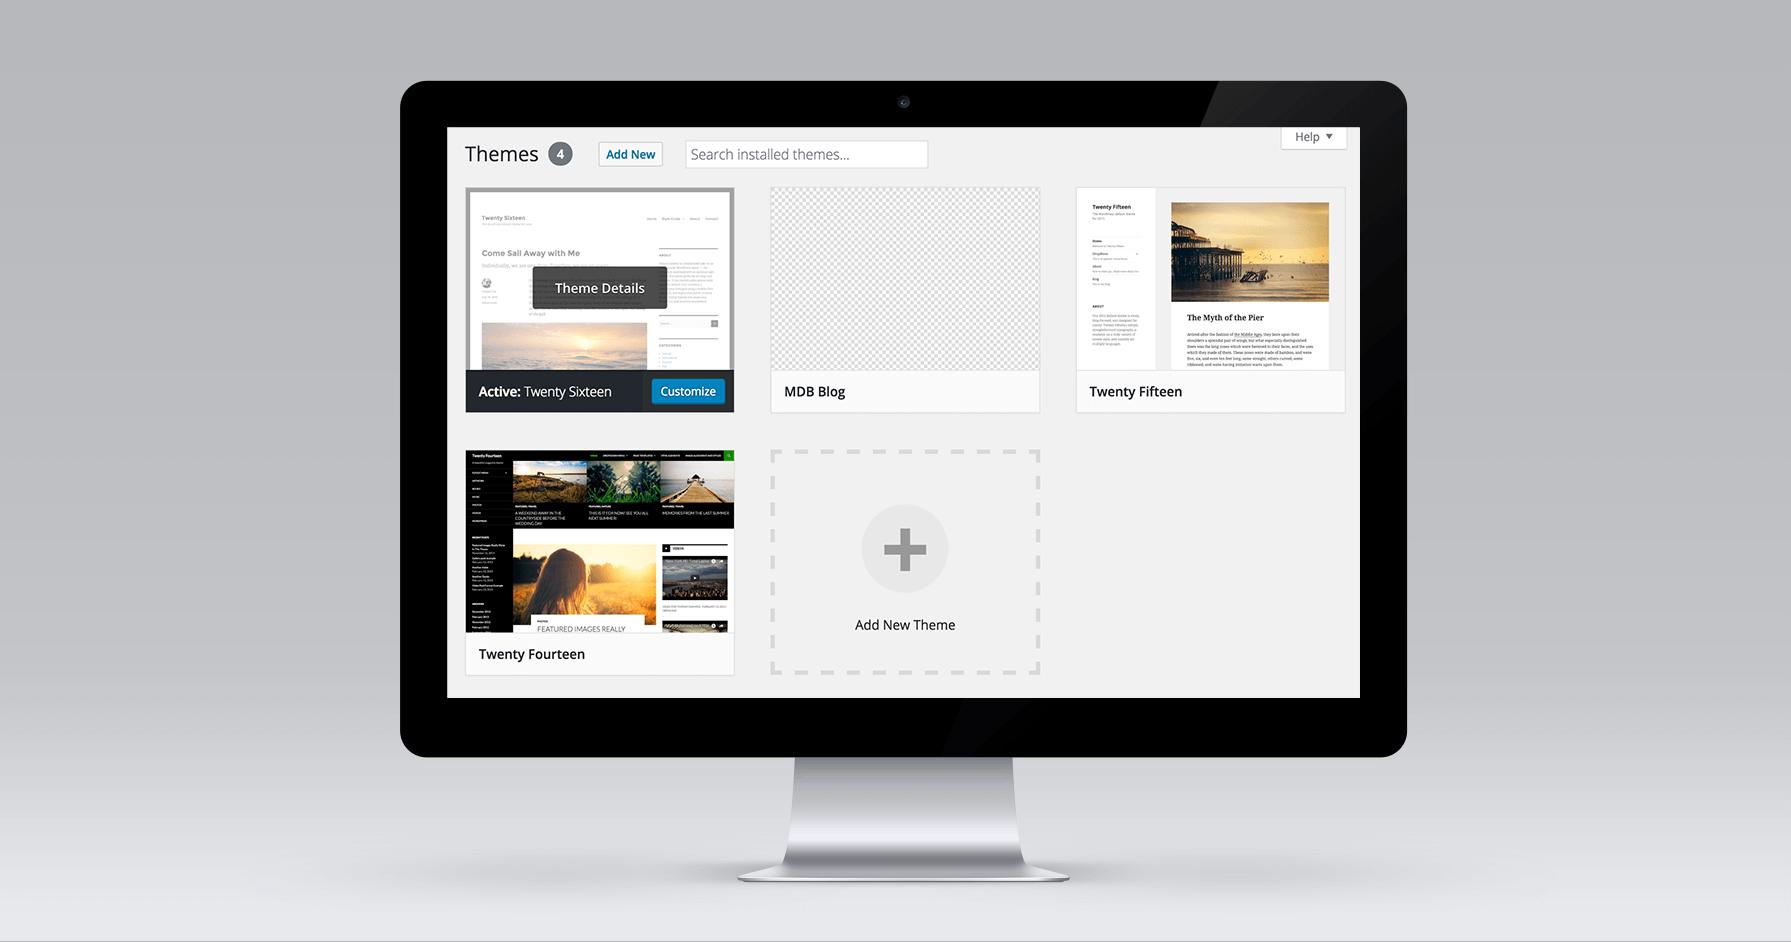 WordPress theme list displayed on desktop